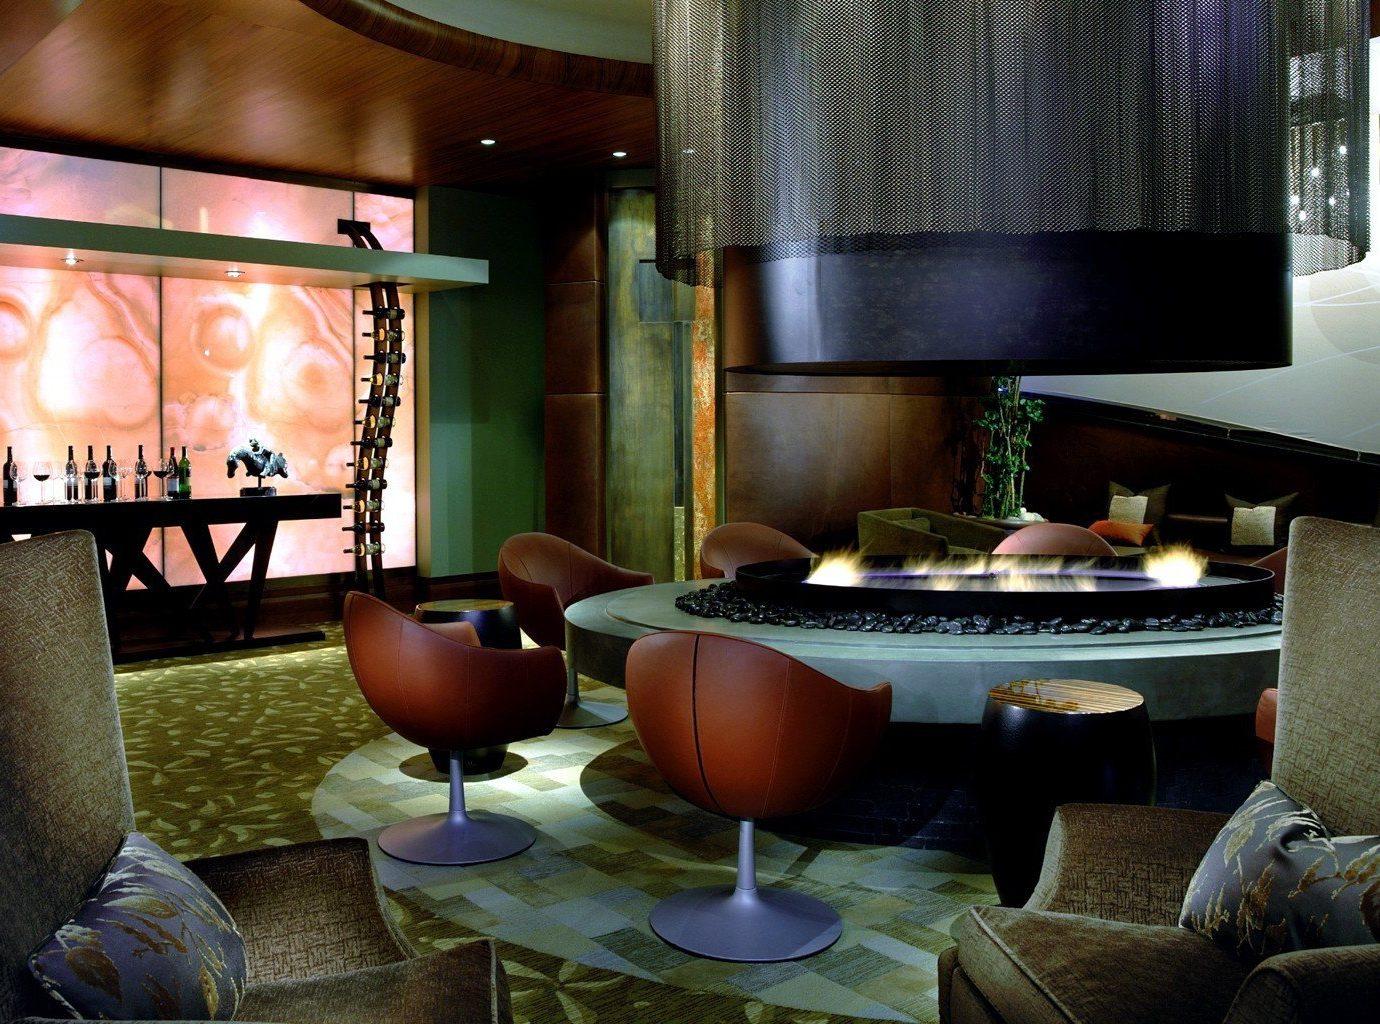 Hotels indoor room living room property interior design home estate Bar screenshot Lobby recreation room restaurant Suite area furniture